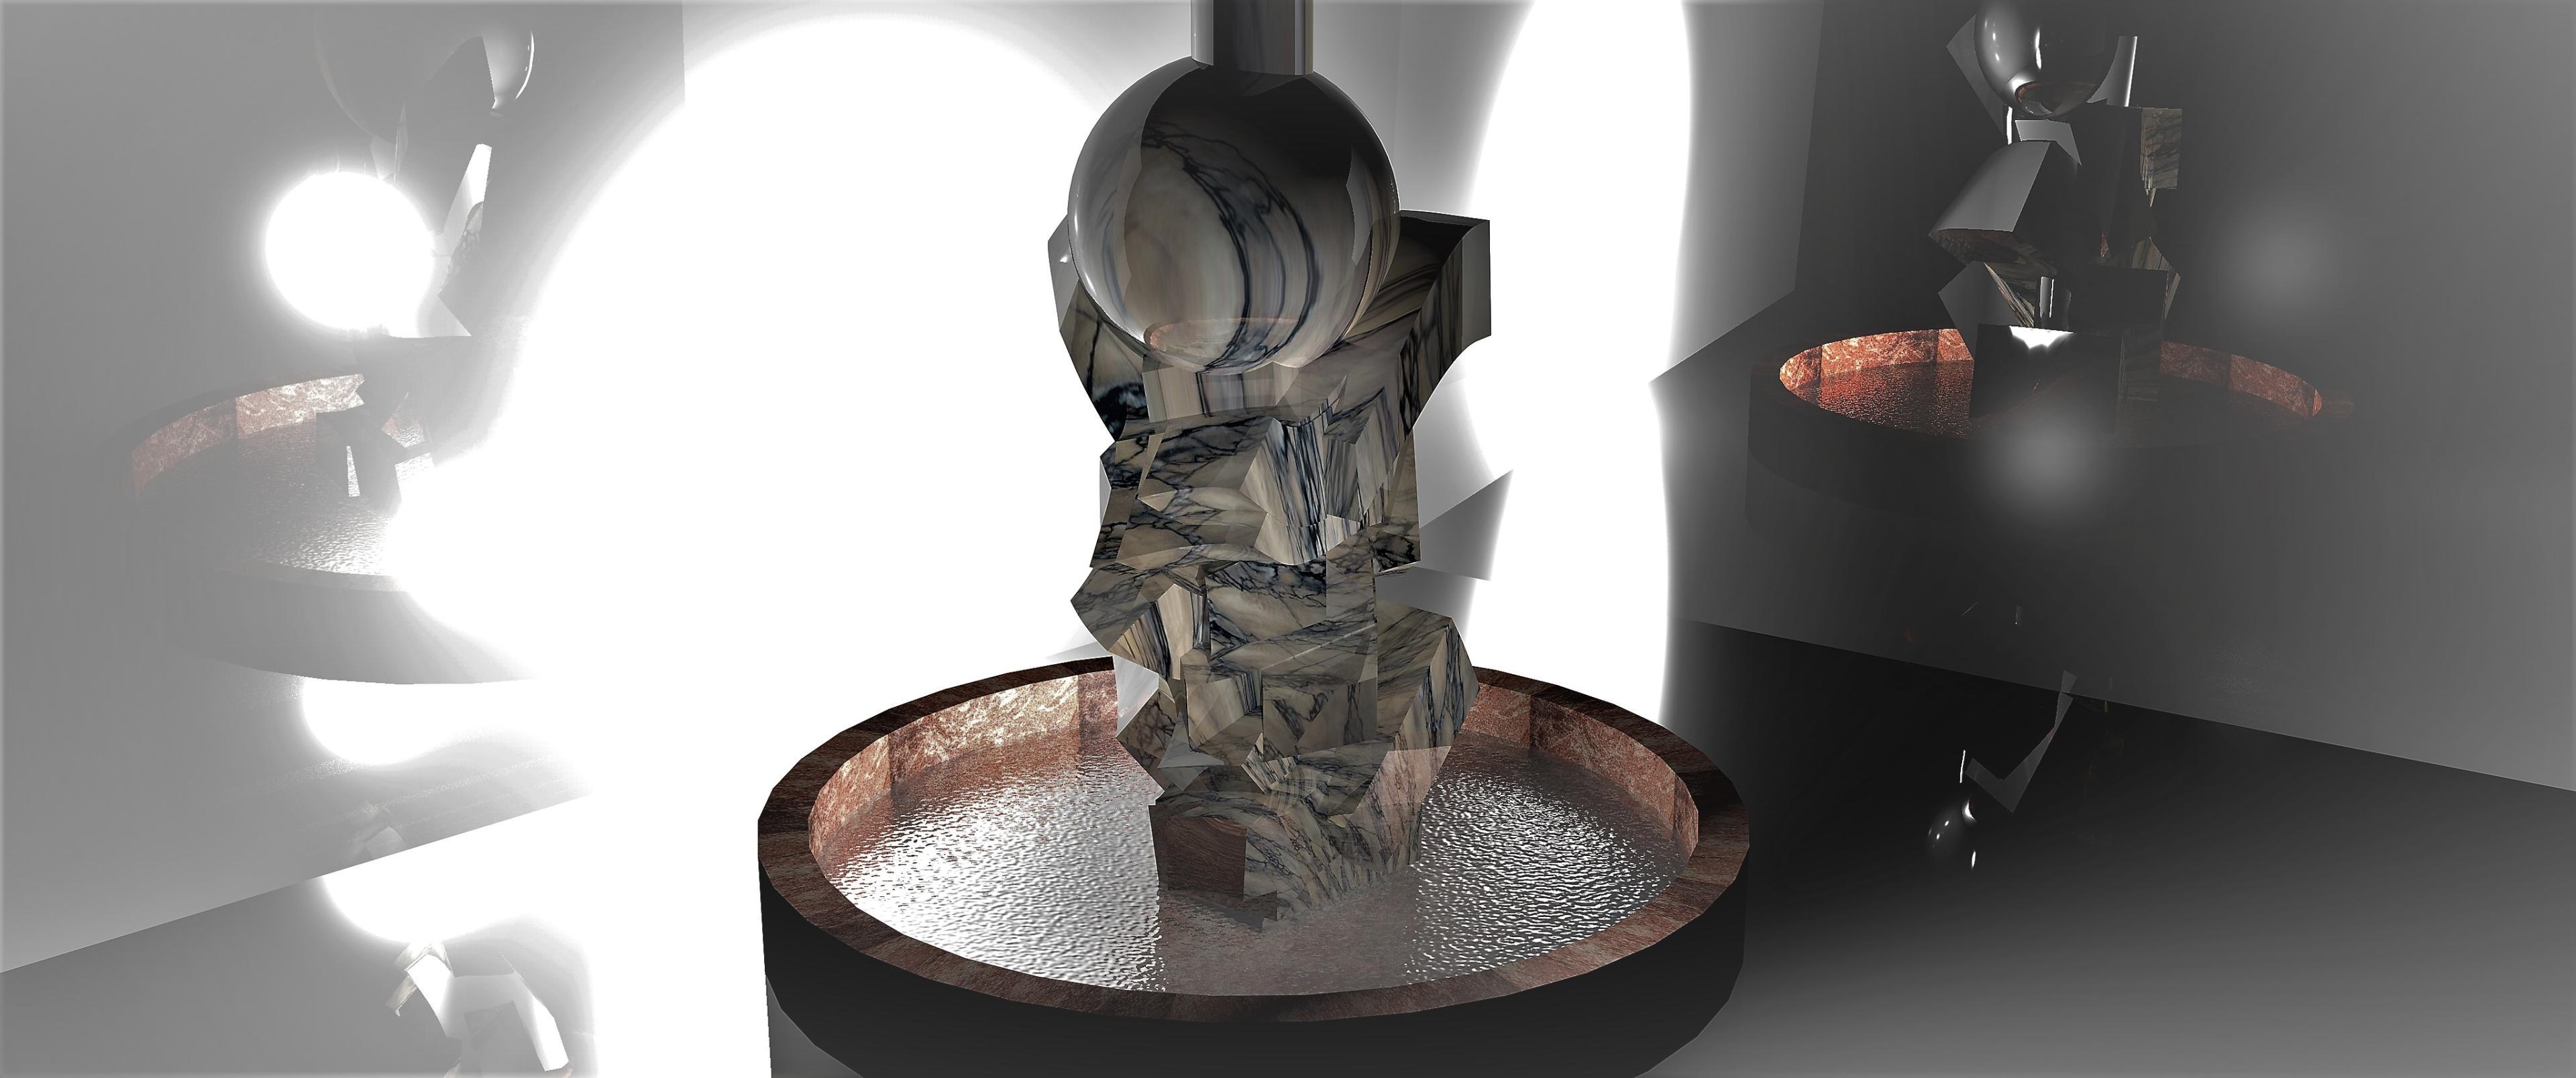 Fontaine Statuaire (2)